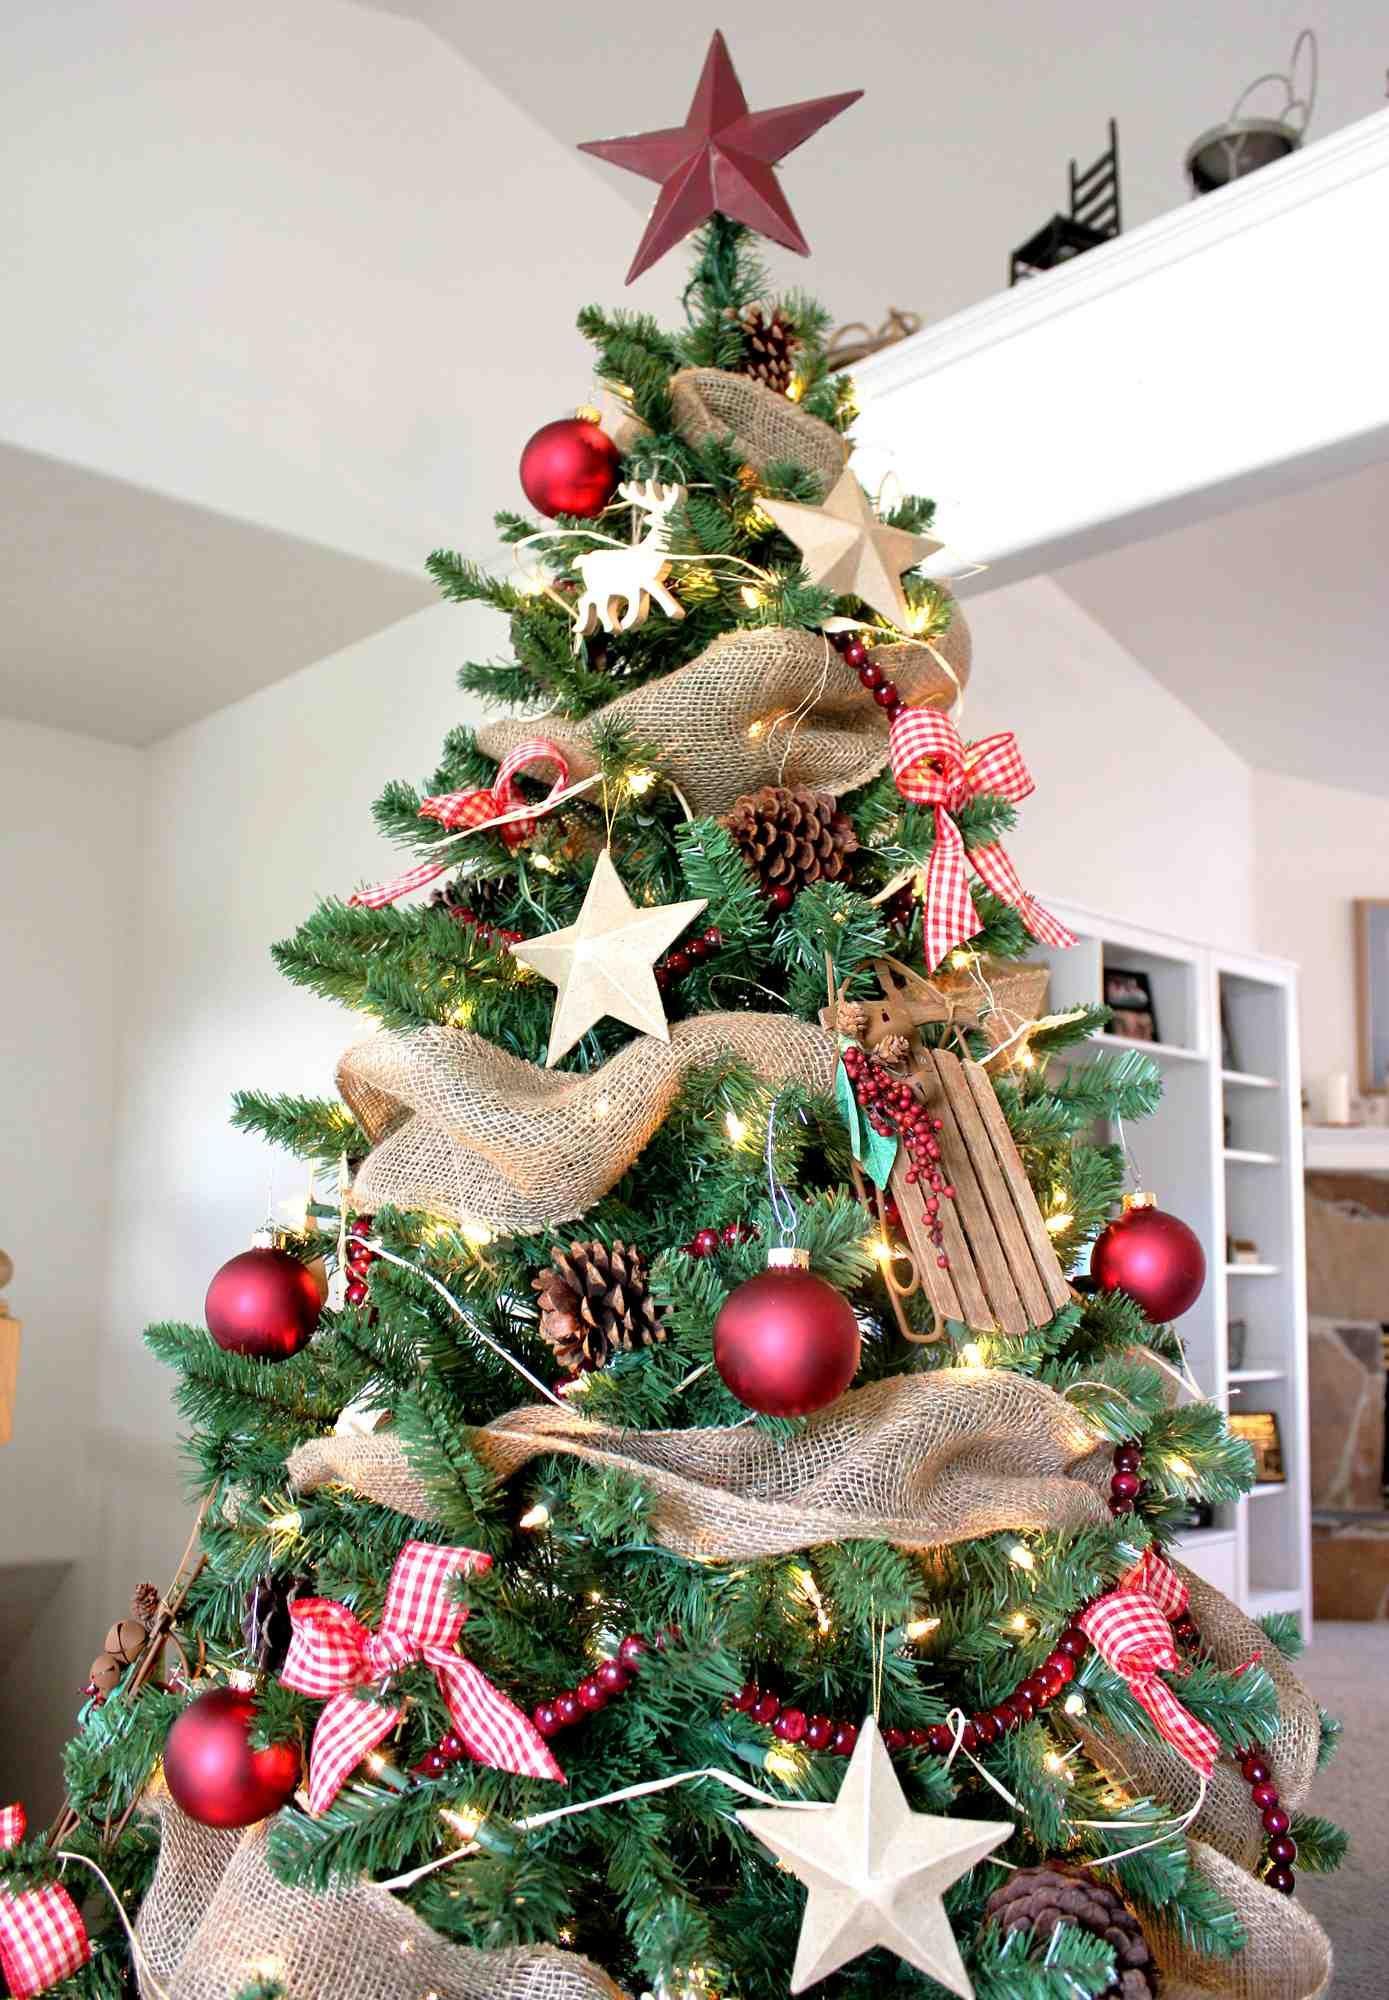 Craft Store Creativity Rustic Christmas Tree Rustic Christmas Christmas Decorations